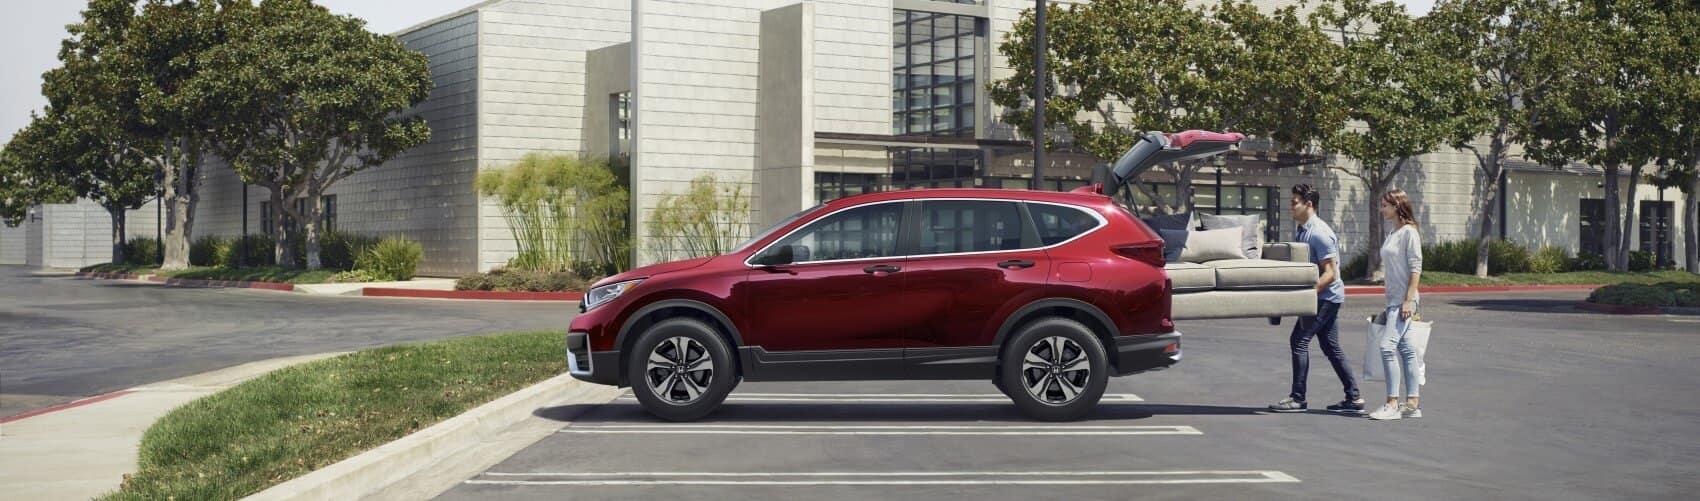 Honda CR-V vs Subaru Forester